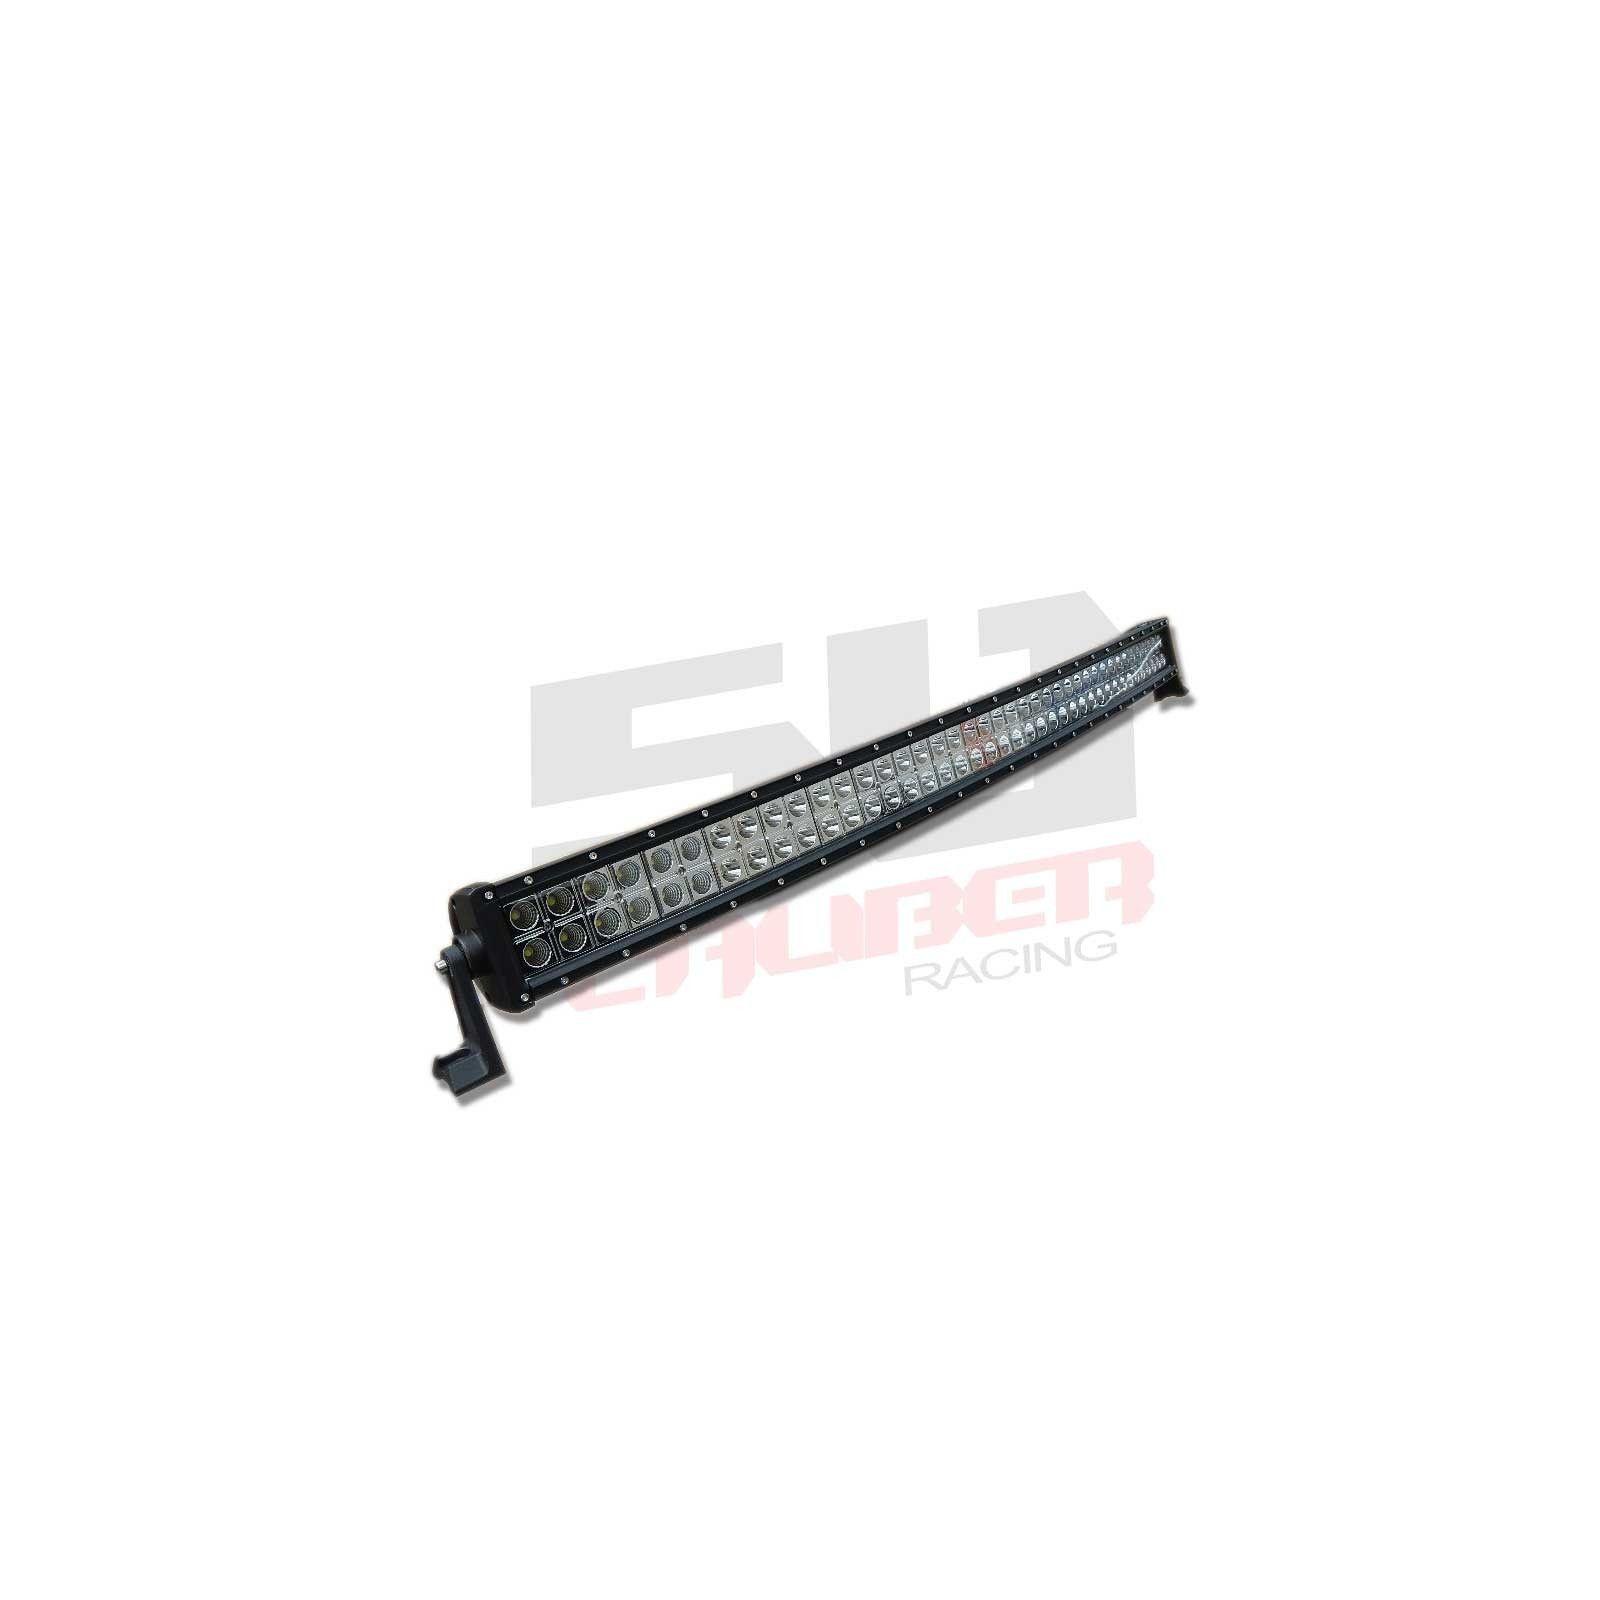 50 Inch Curved Led Light Bar